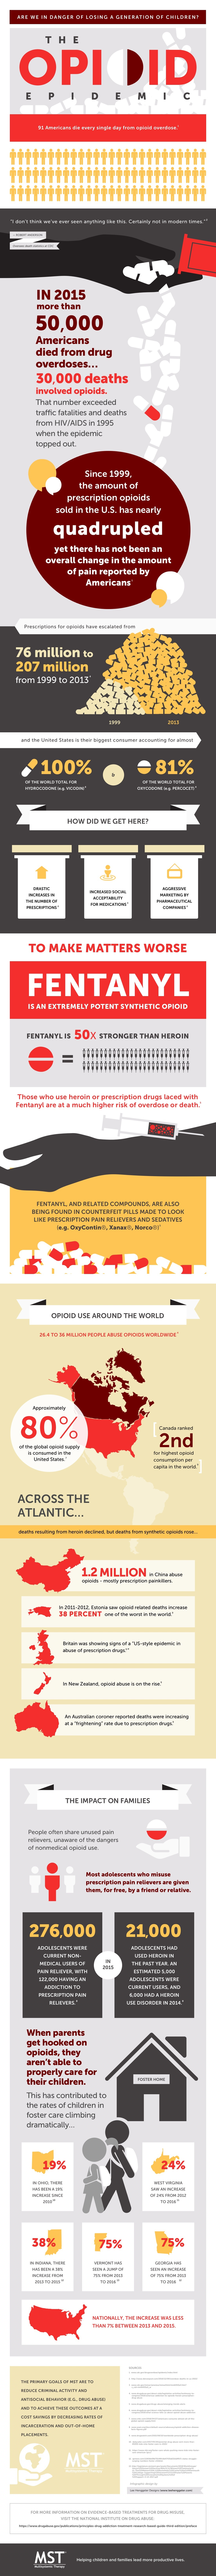 opioid epidemic statistics infographic.jpg